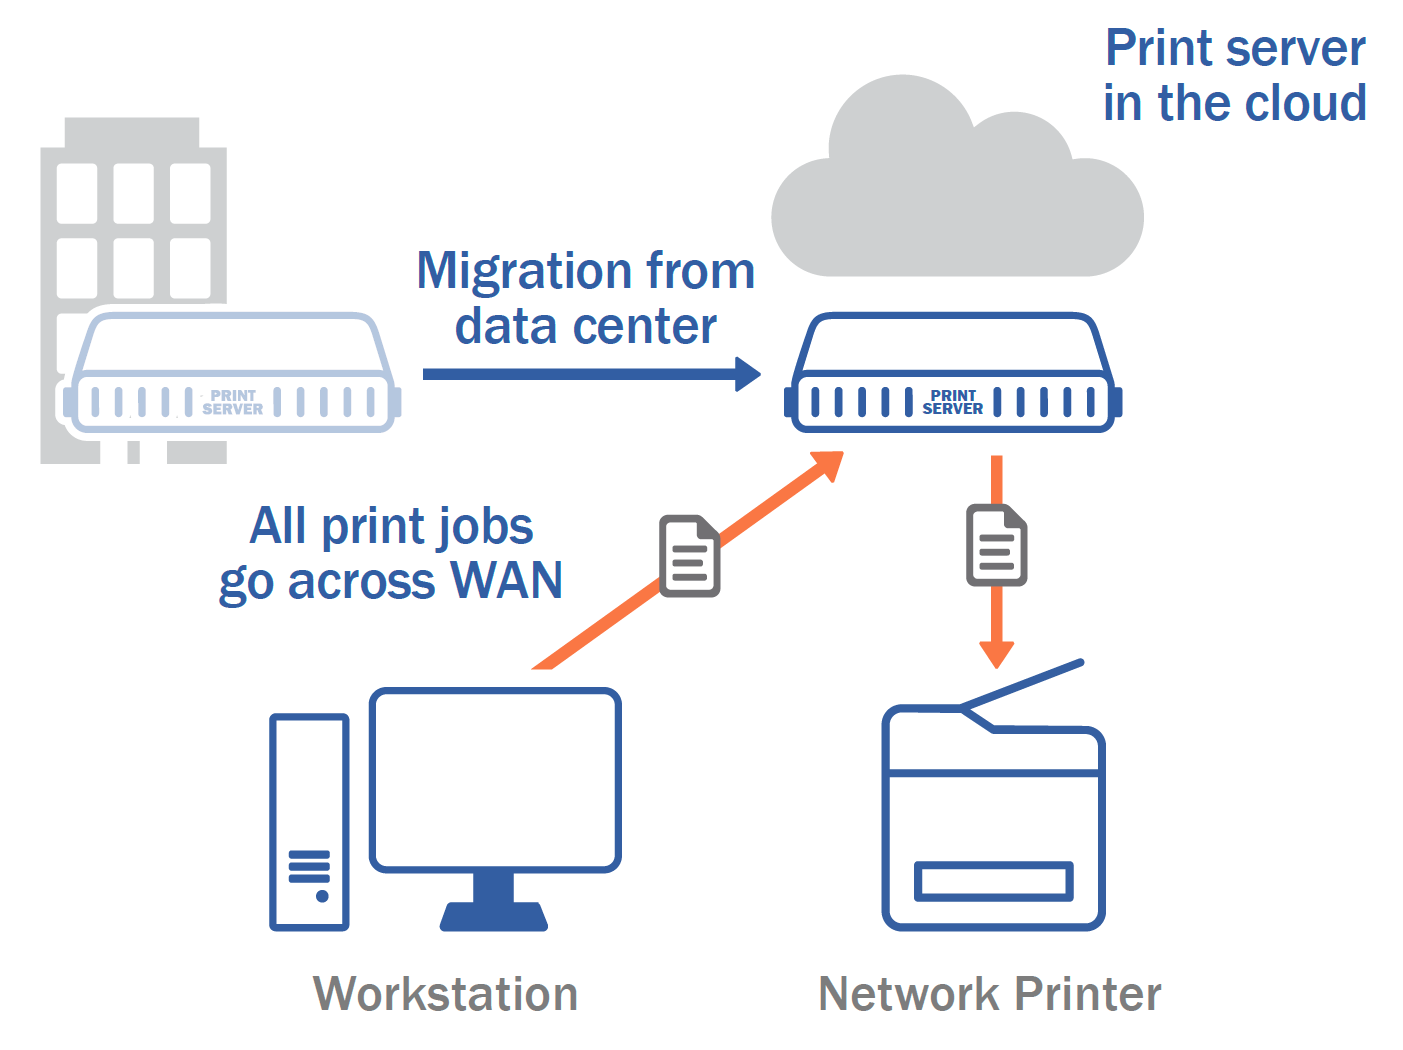 Print Server in the Cloud